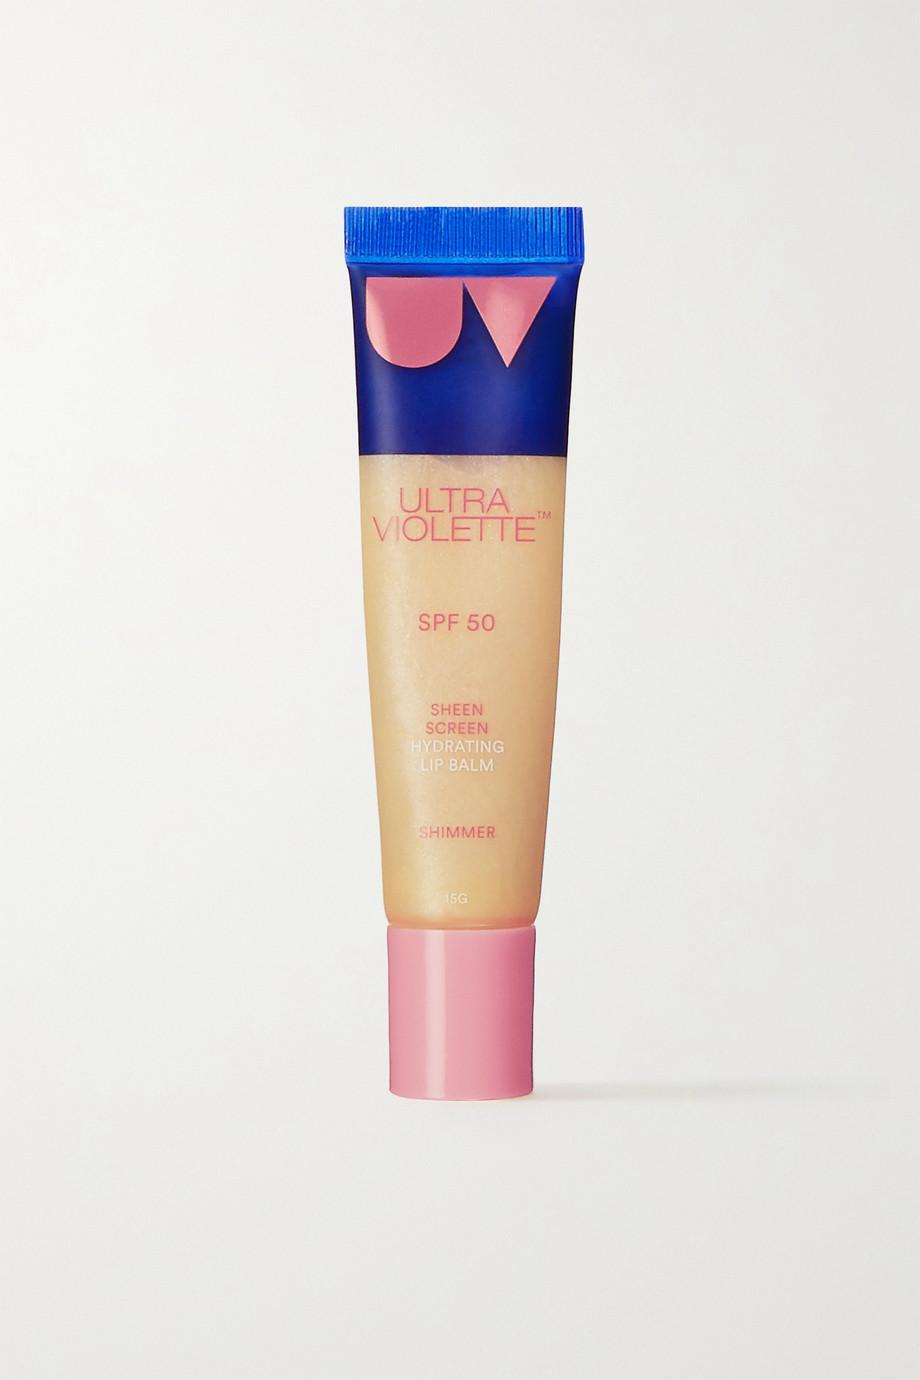 Ultra Violette Sheen Screen SPF50 Hydrating Lip Balm - Shimmer, 15g